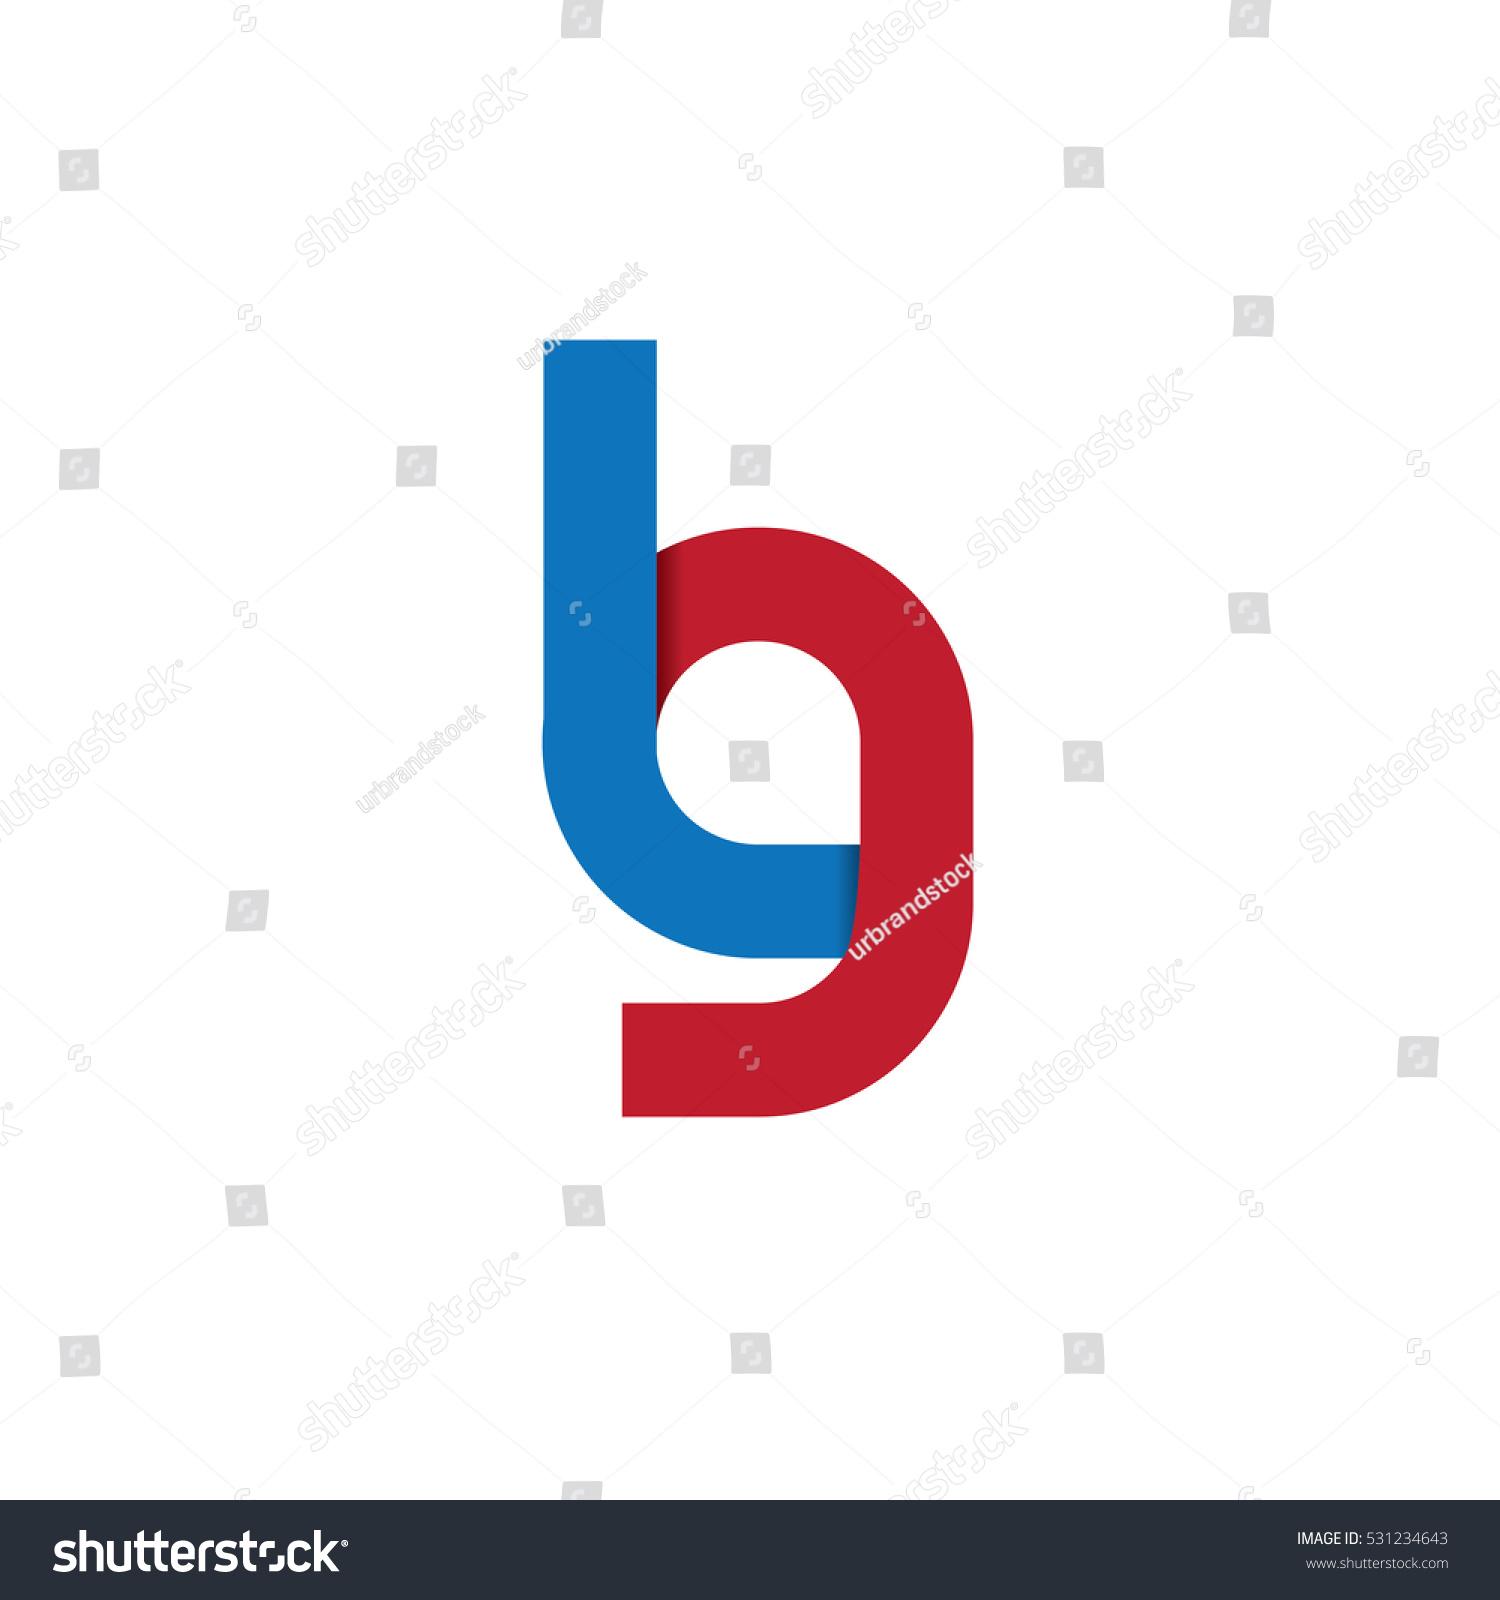 Initial Letter Lg Design Logo Blue Stock Vector Royalty Free